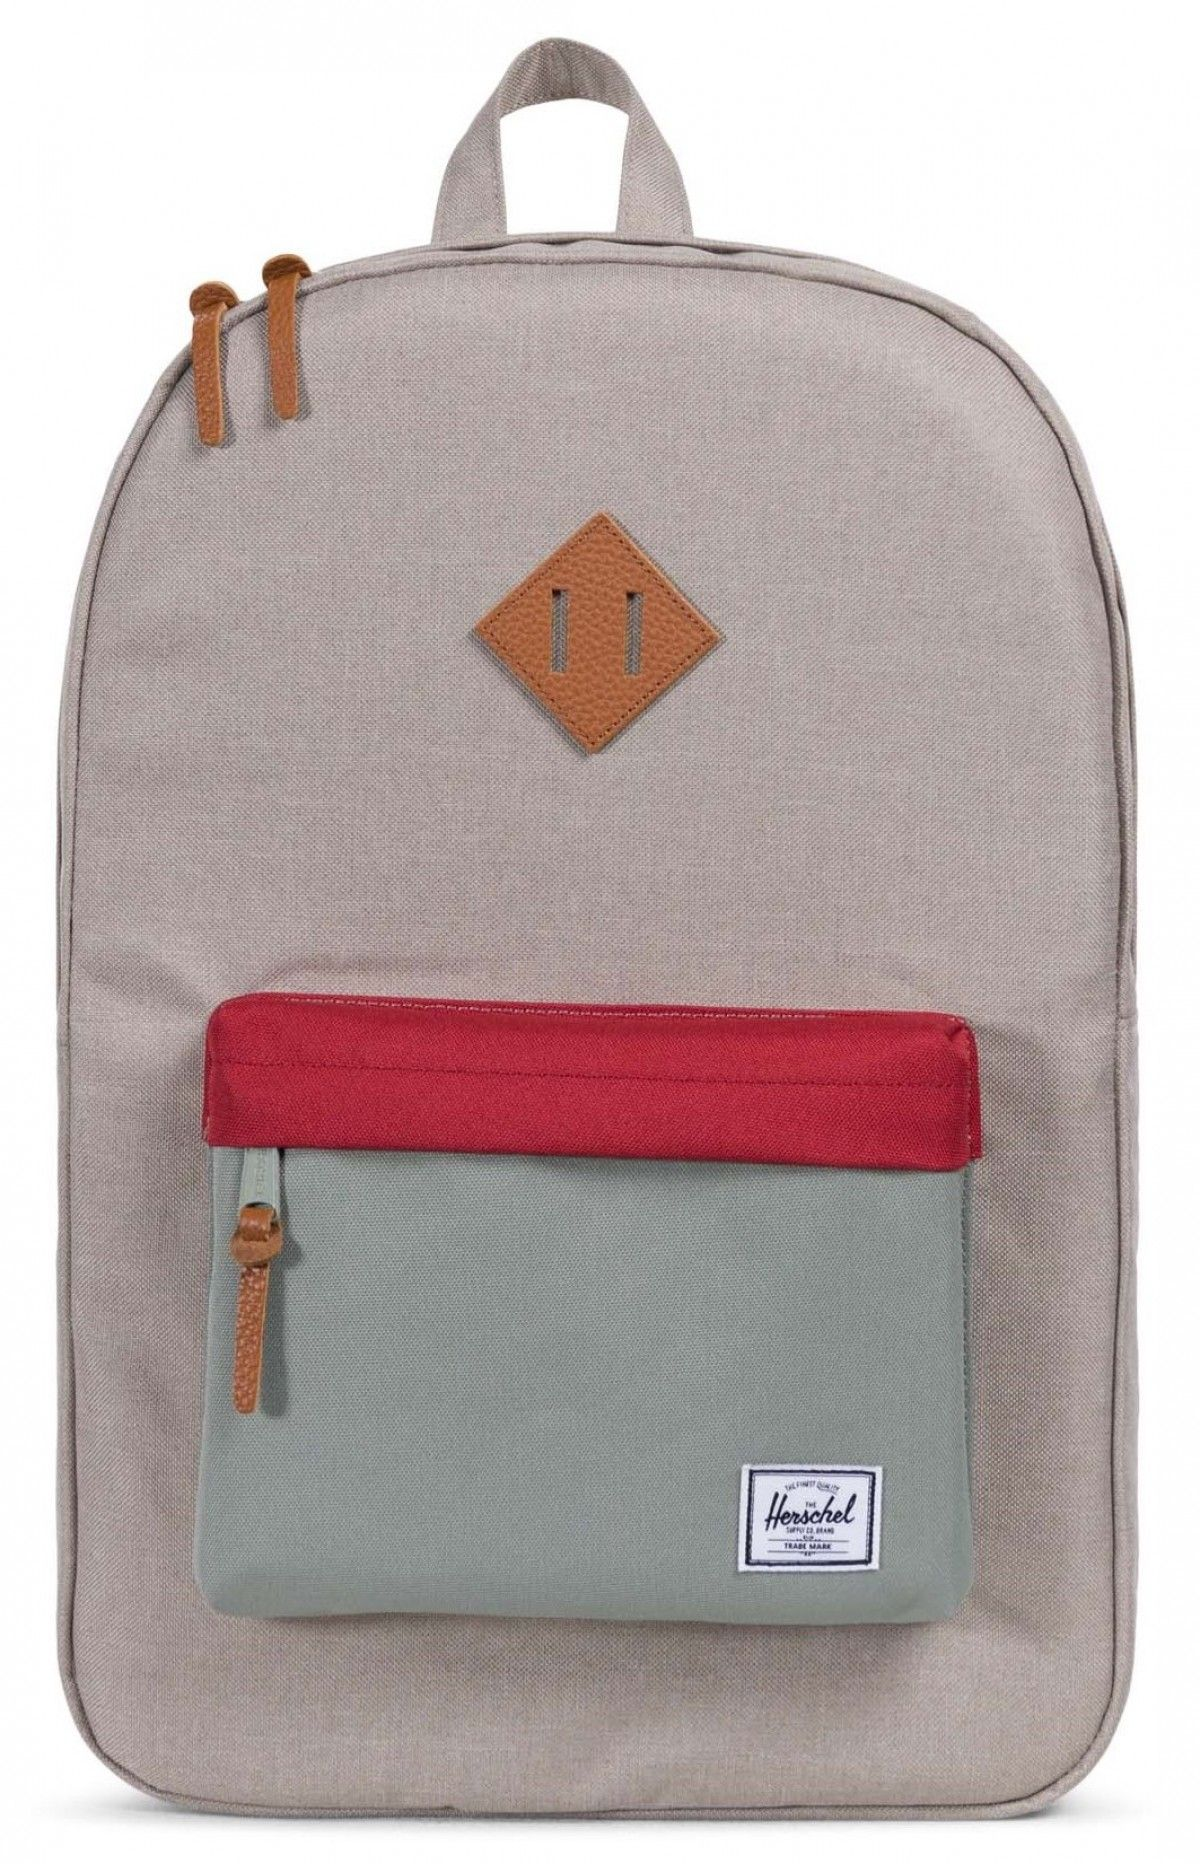 Herschel Heritage Backpack 600D Poly Light Khaki Crosshatch Shadow Brick Red  Tan b78e54882da76